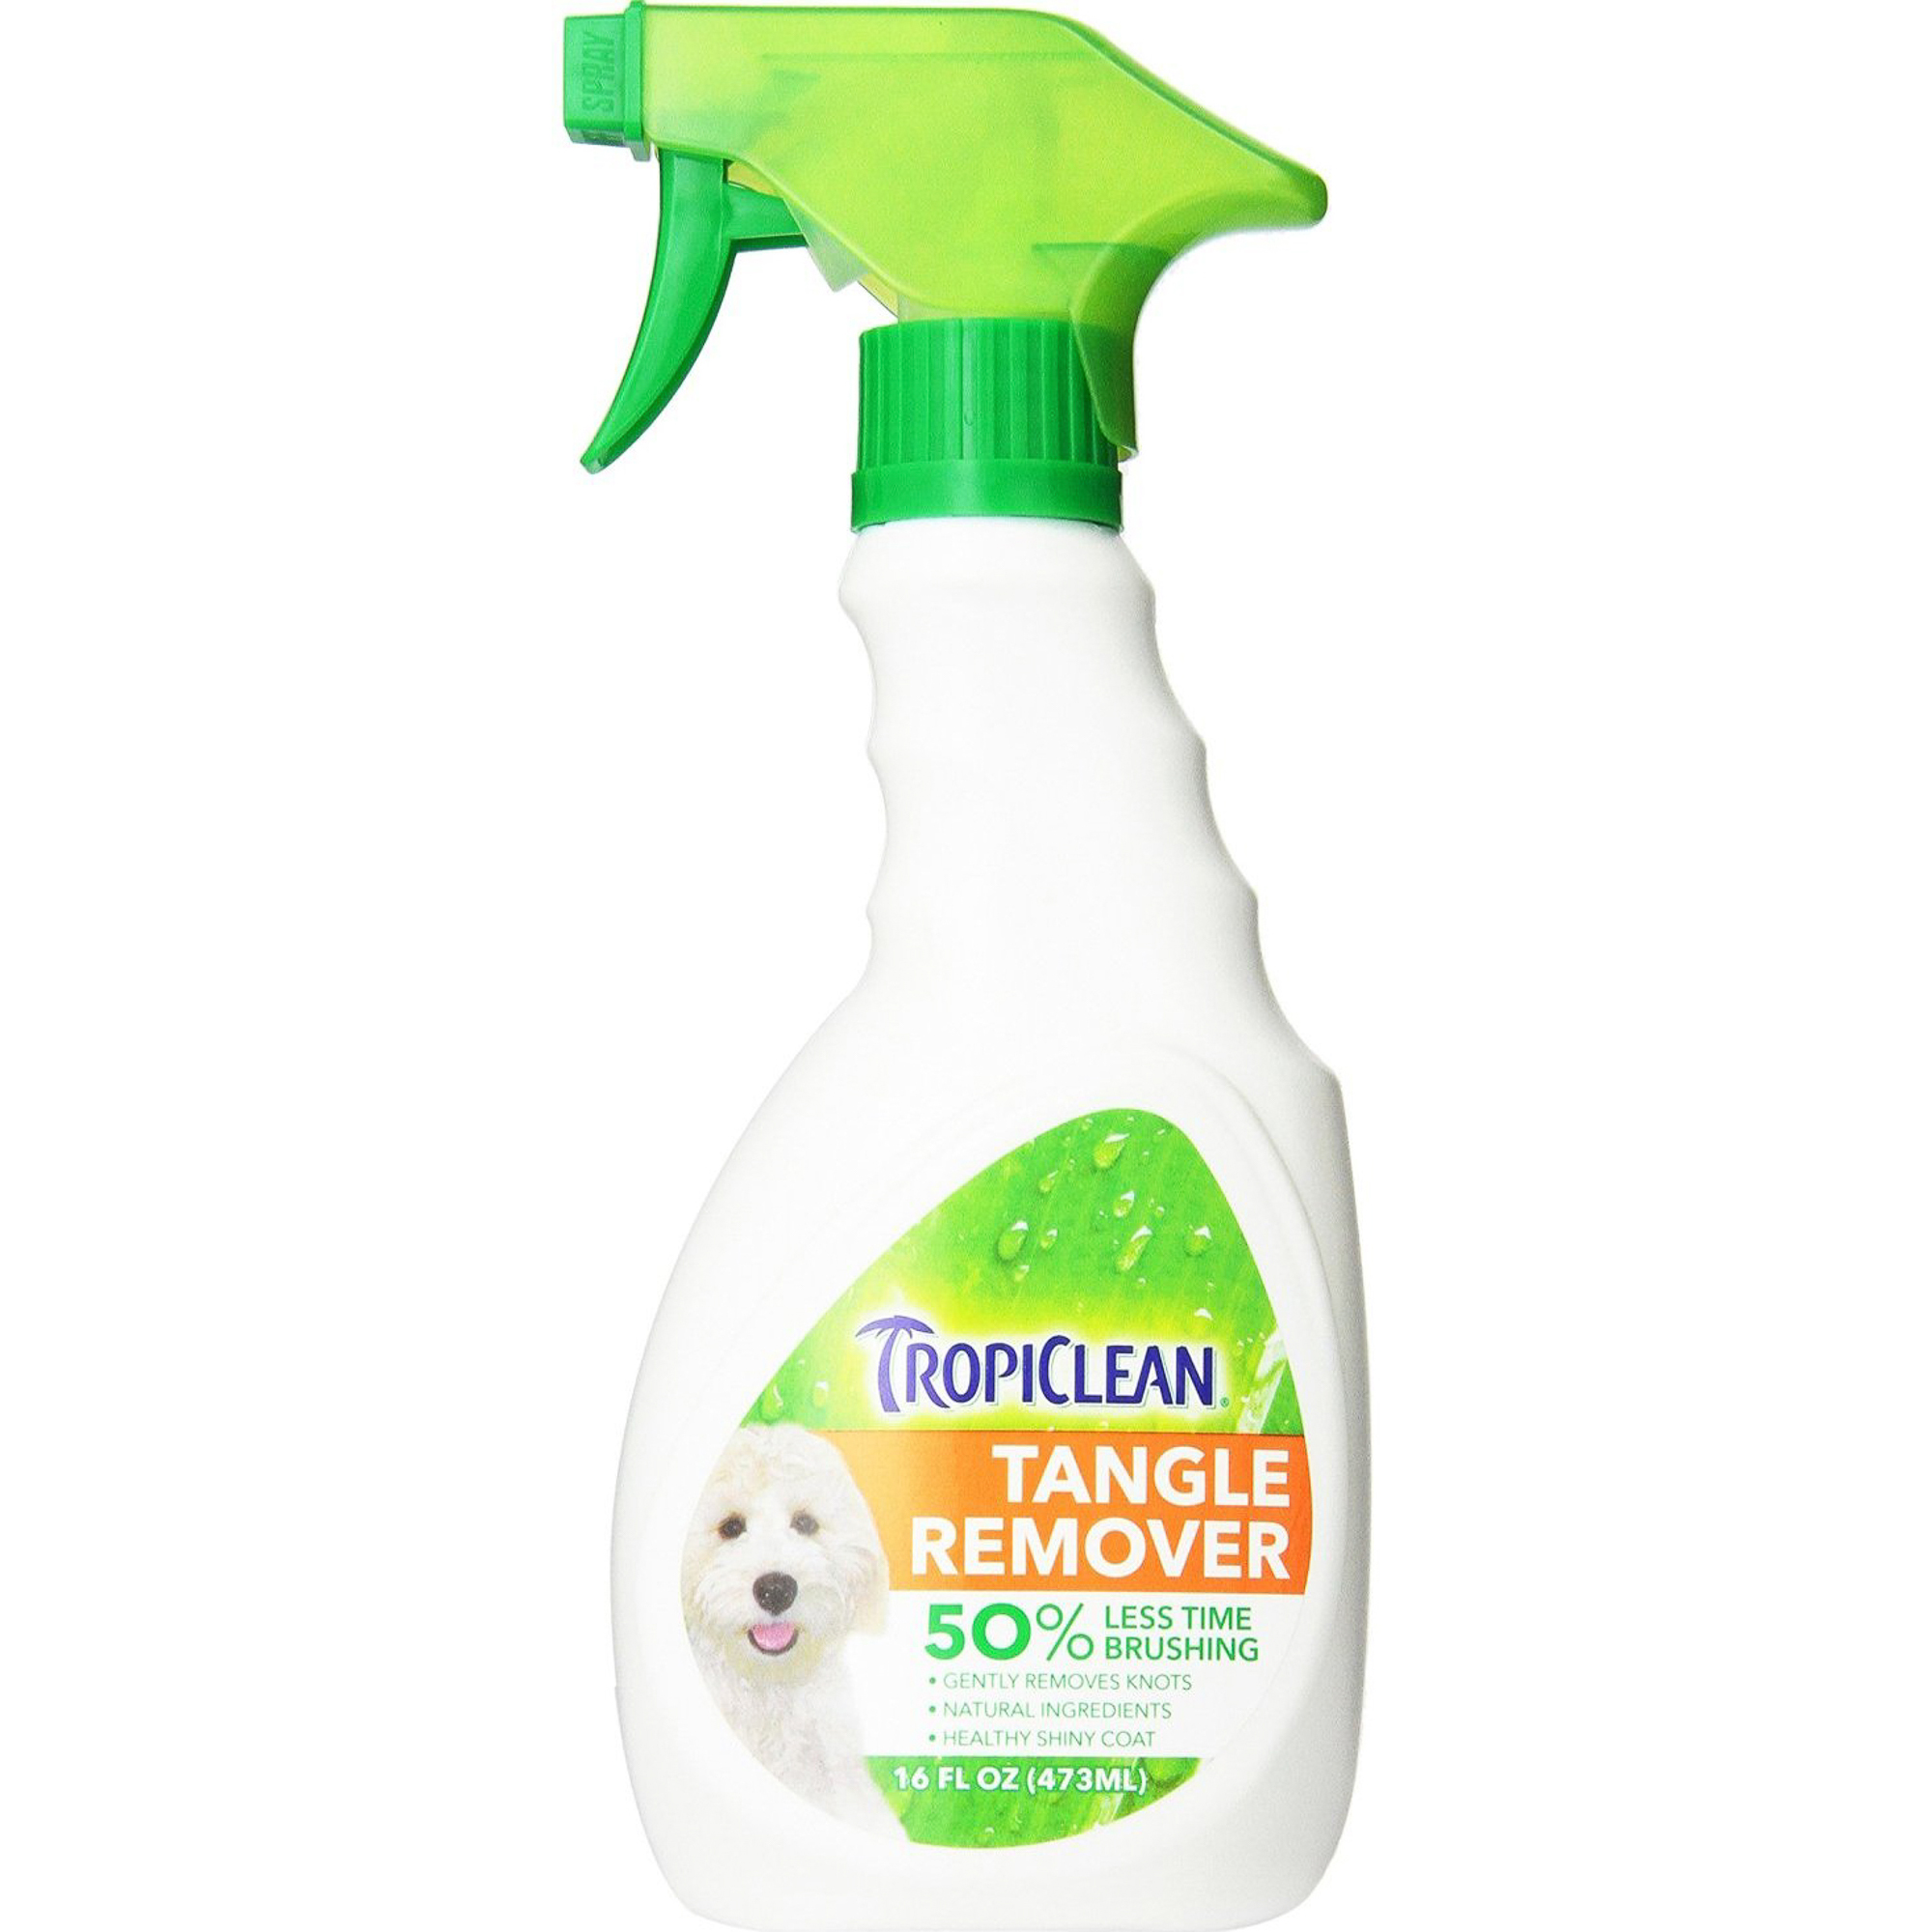 Спрей для кошек и собак TropiClean Tangle Remover От колтунов 473 мл.